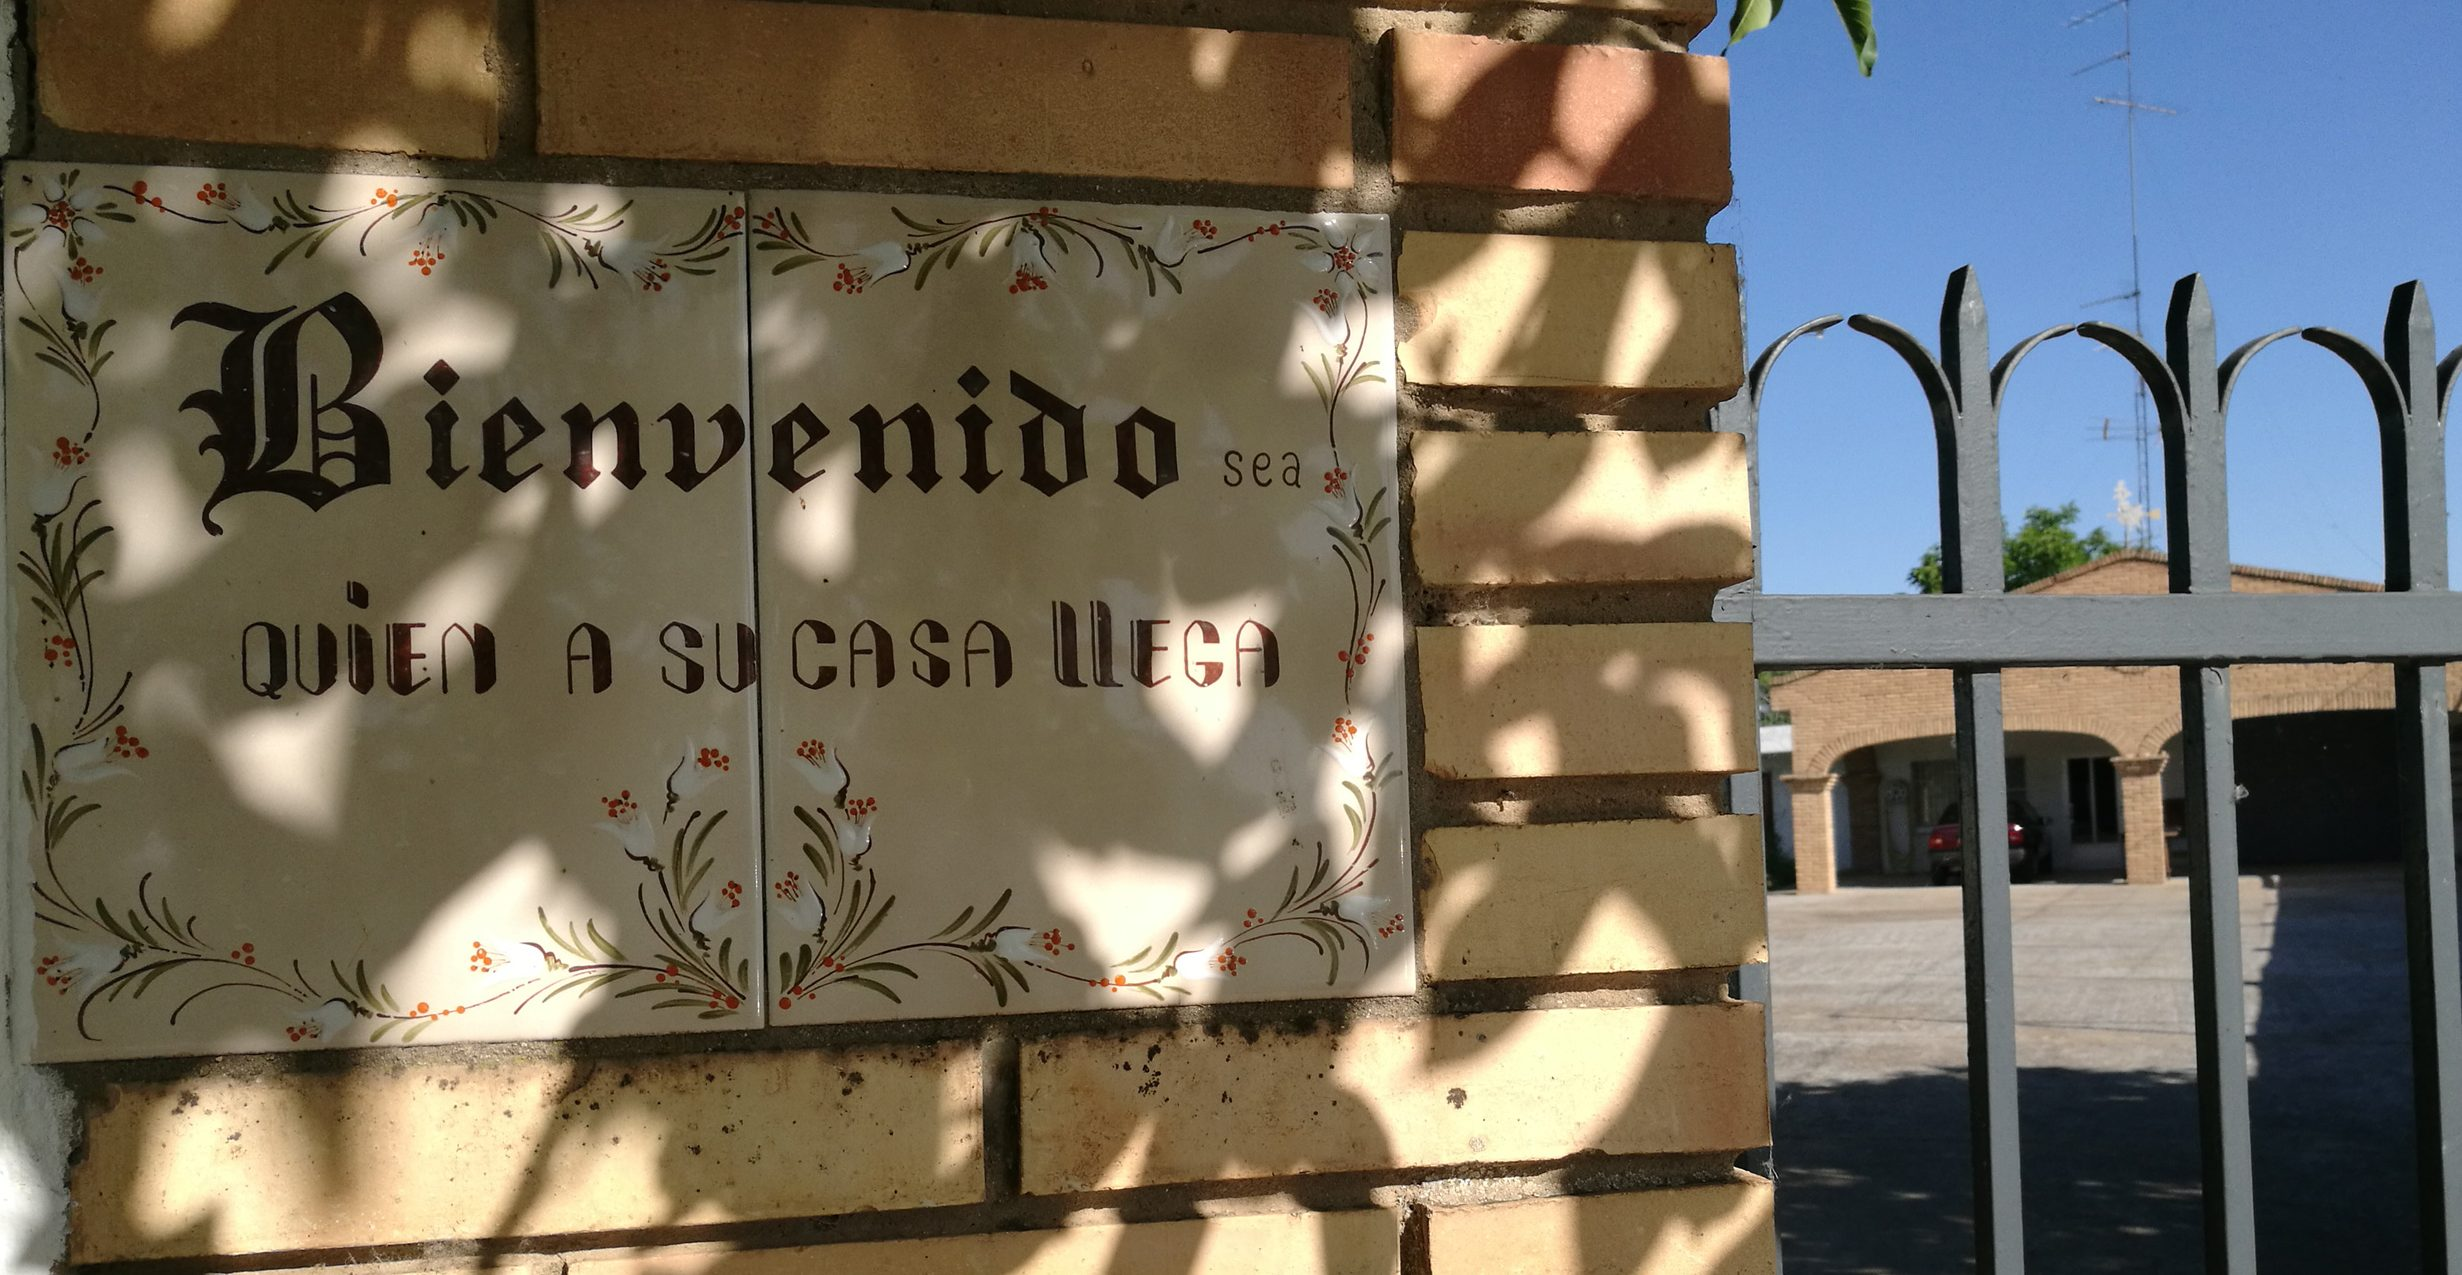 https://www.fincabienvenido.com/wp-content/uploads/2016/09/bienvenido-e1495782311350.jpg